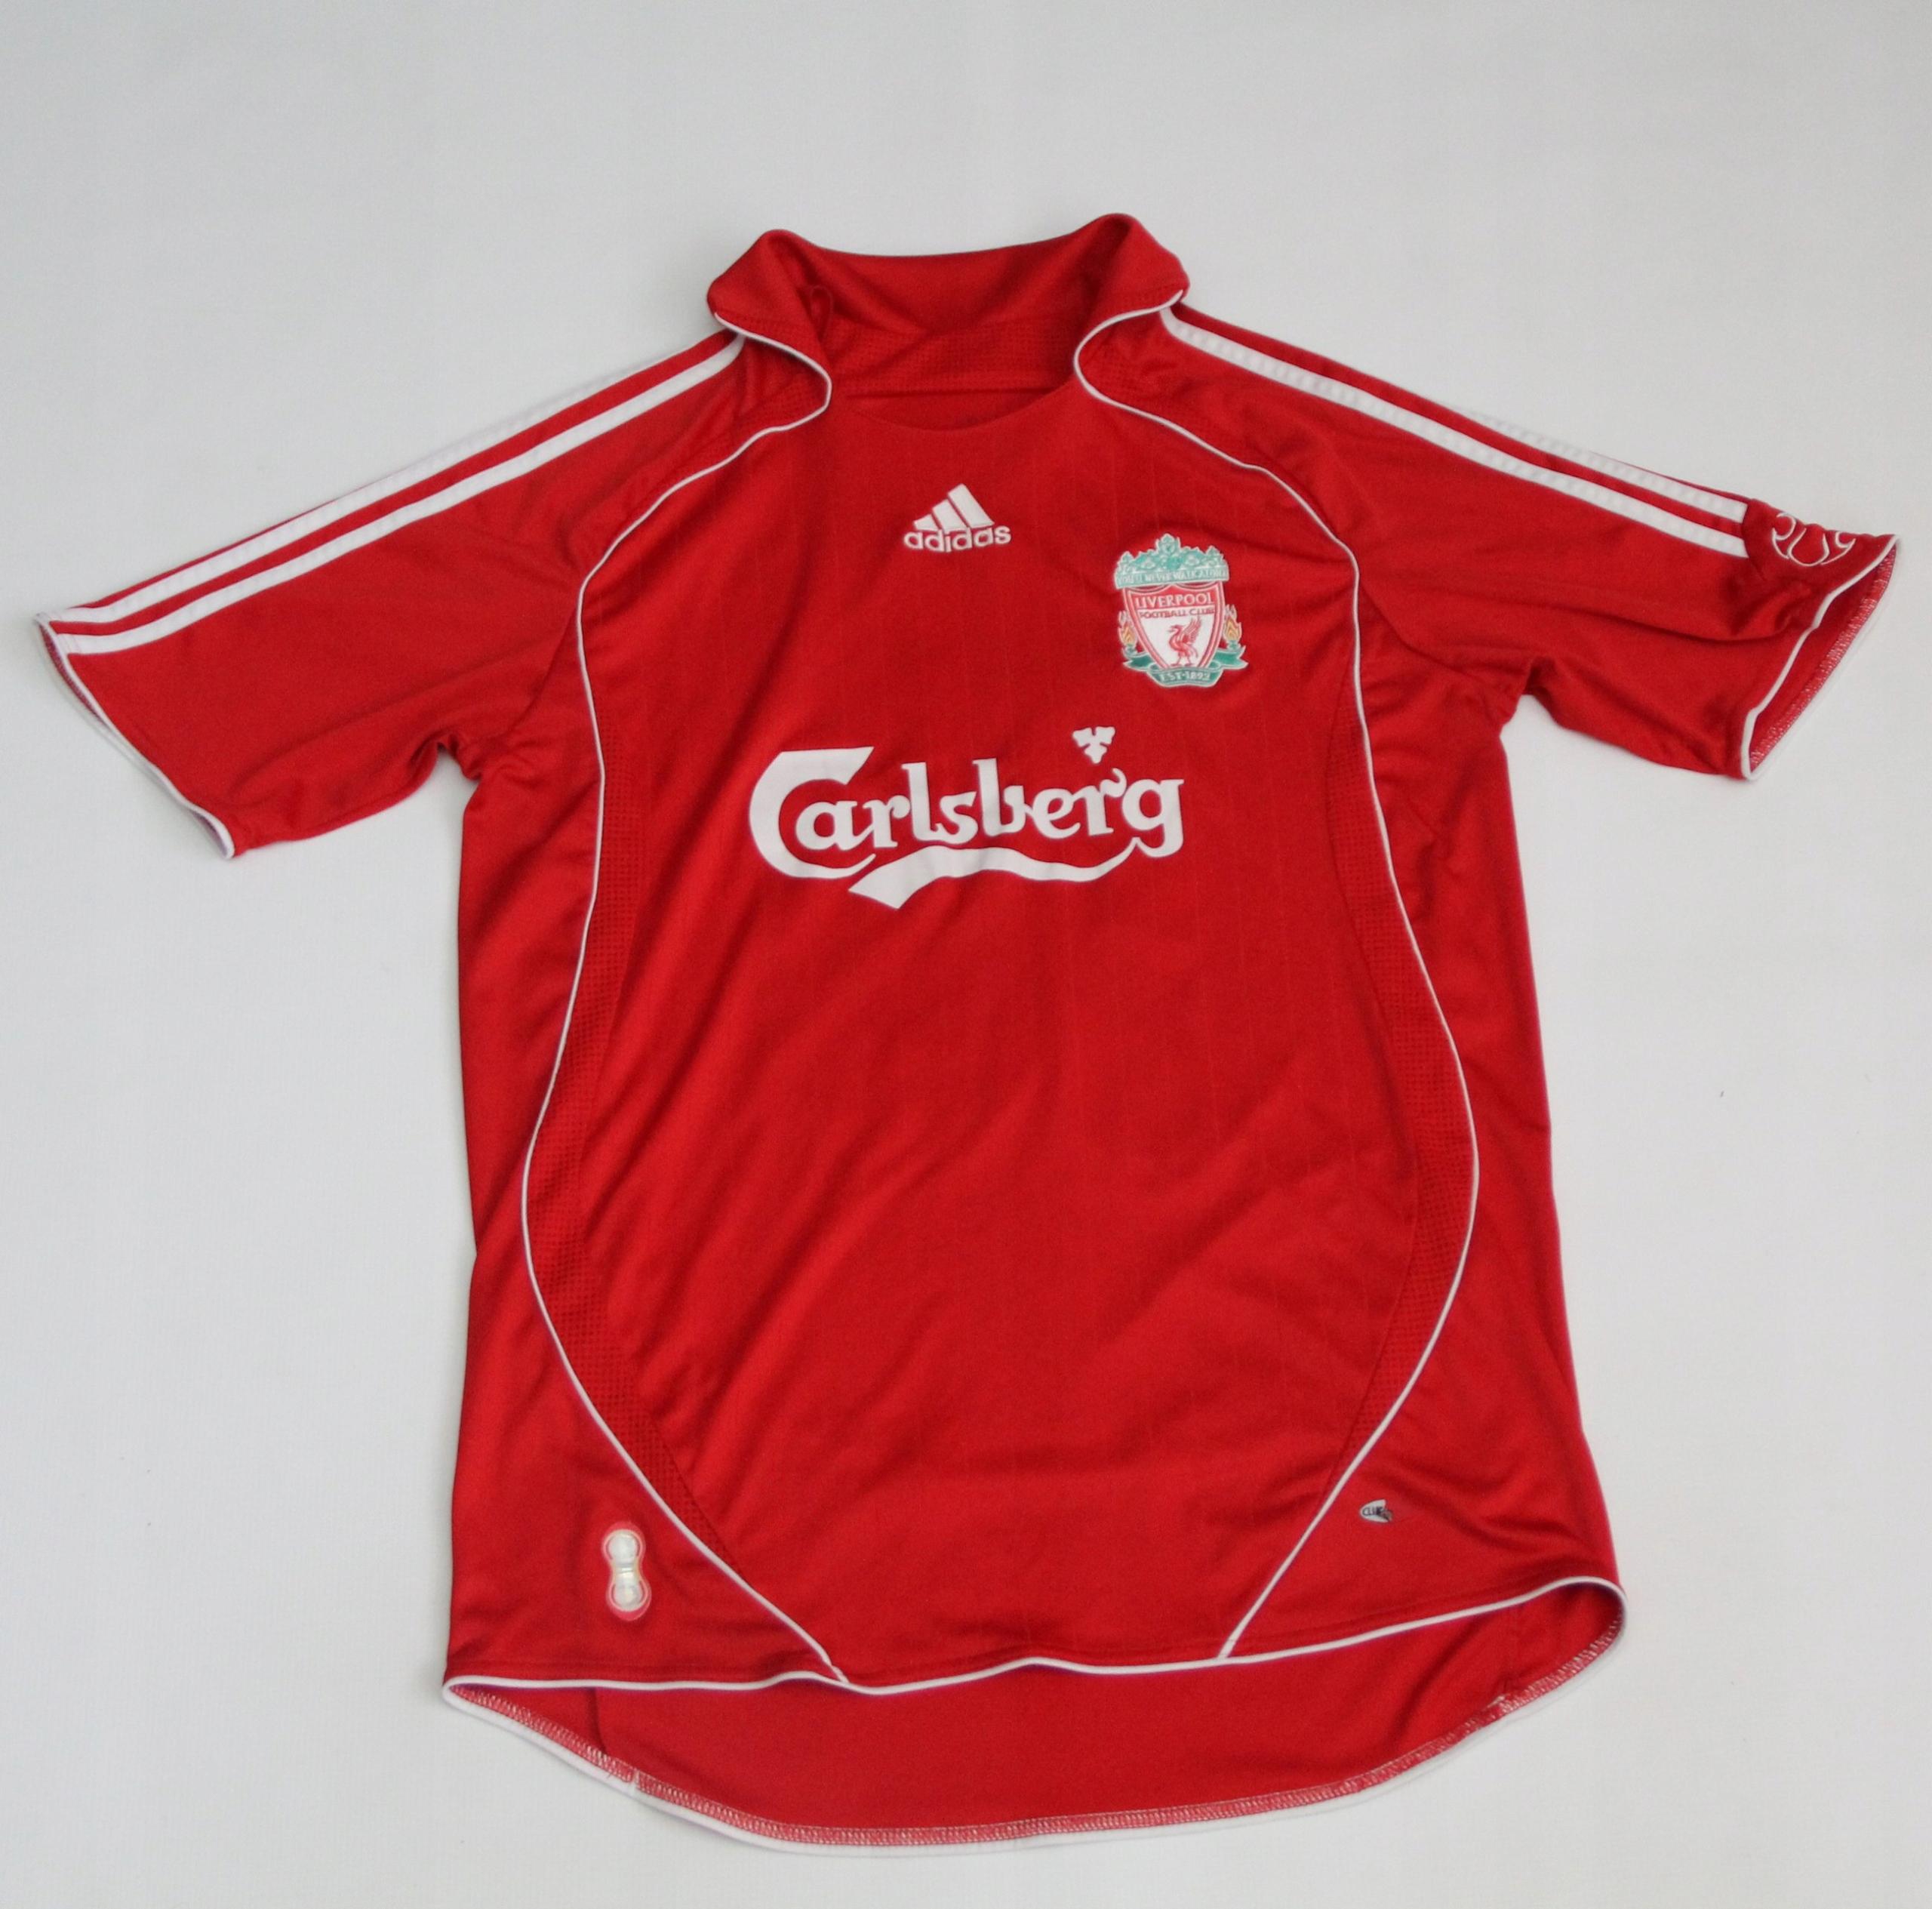 0921bb30c Koszulka Adidas Liverpool 18-SAUCER - 7705370902 - oficjalne ...